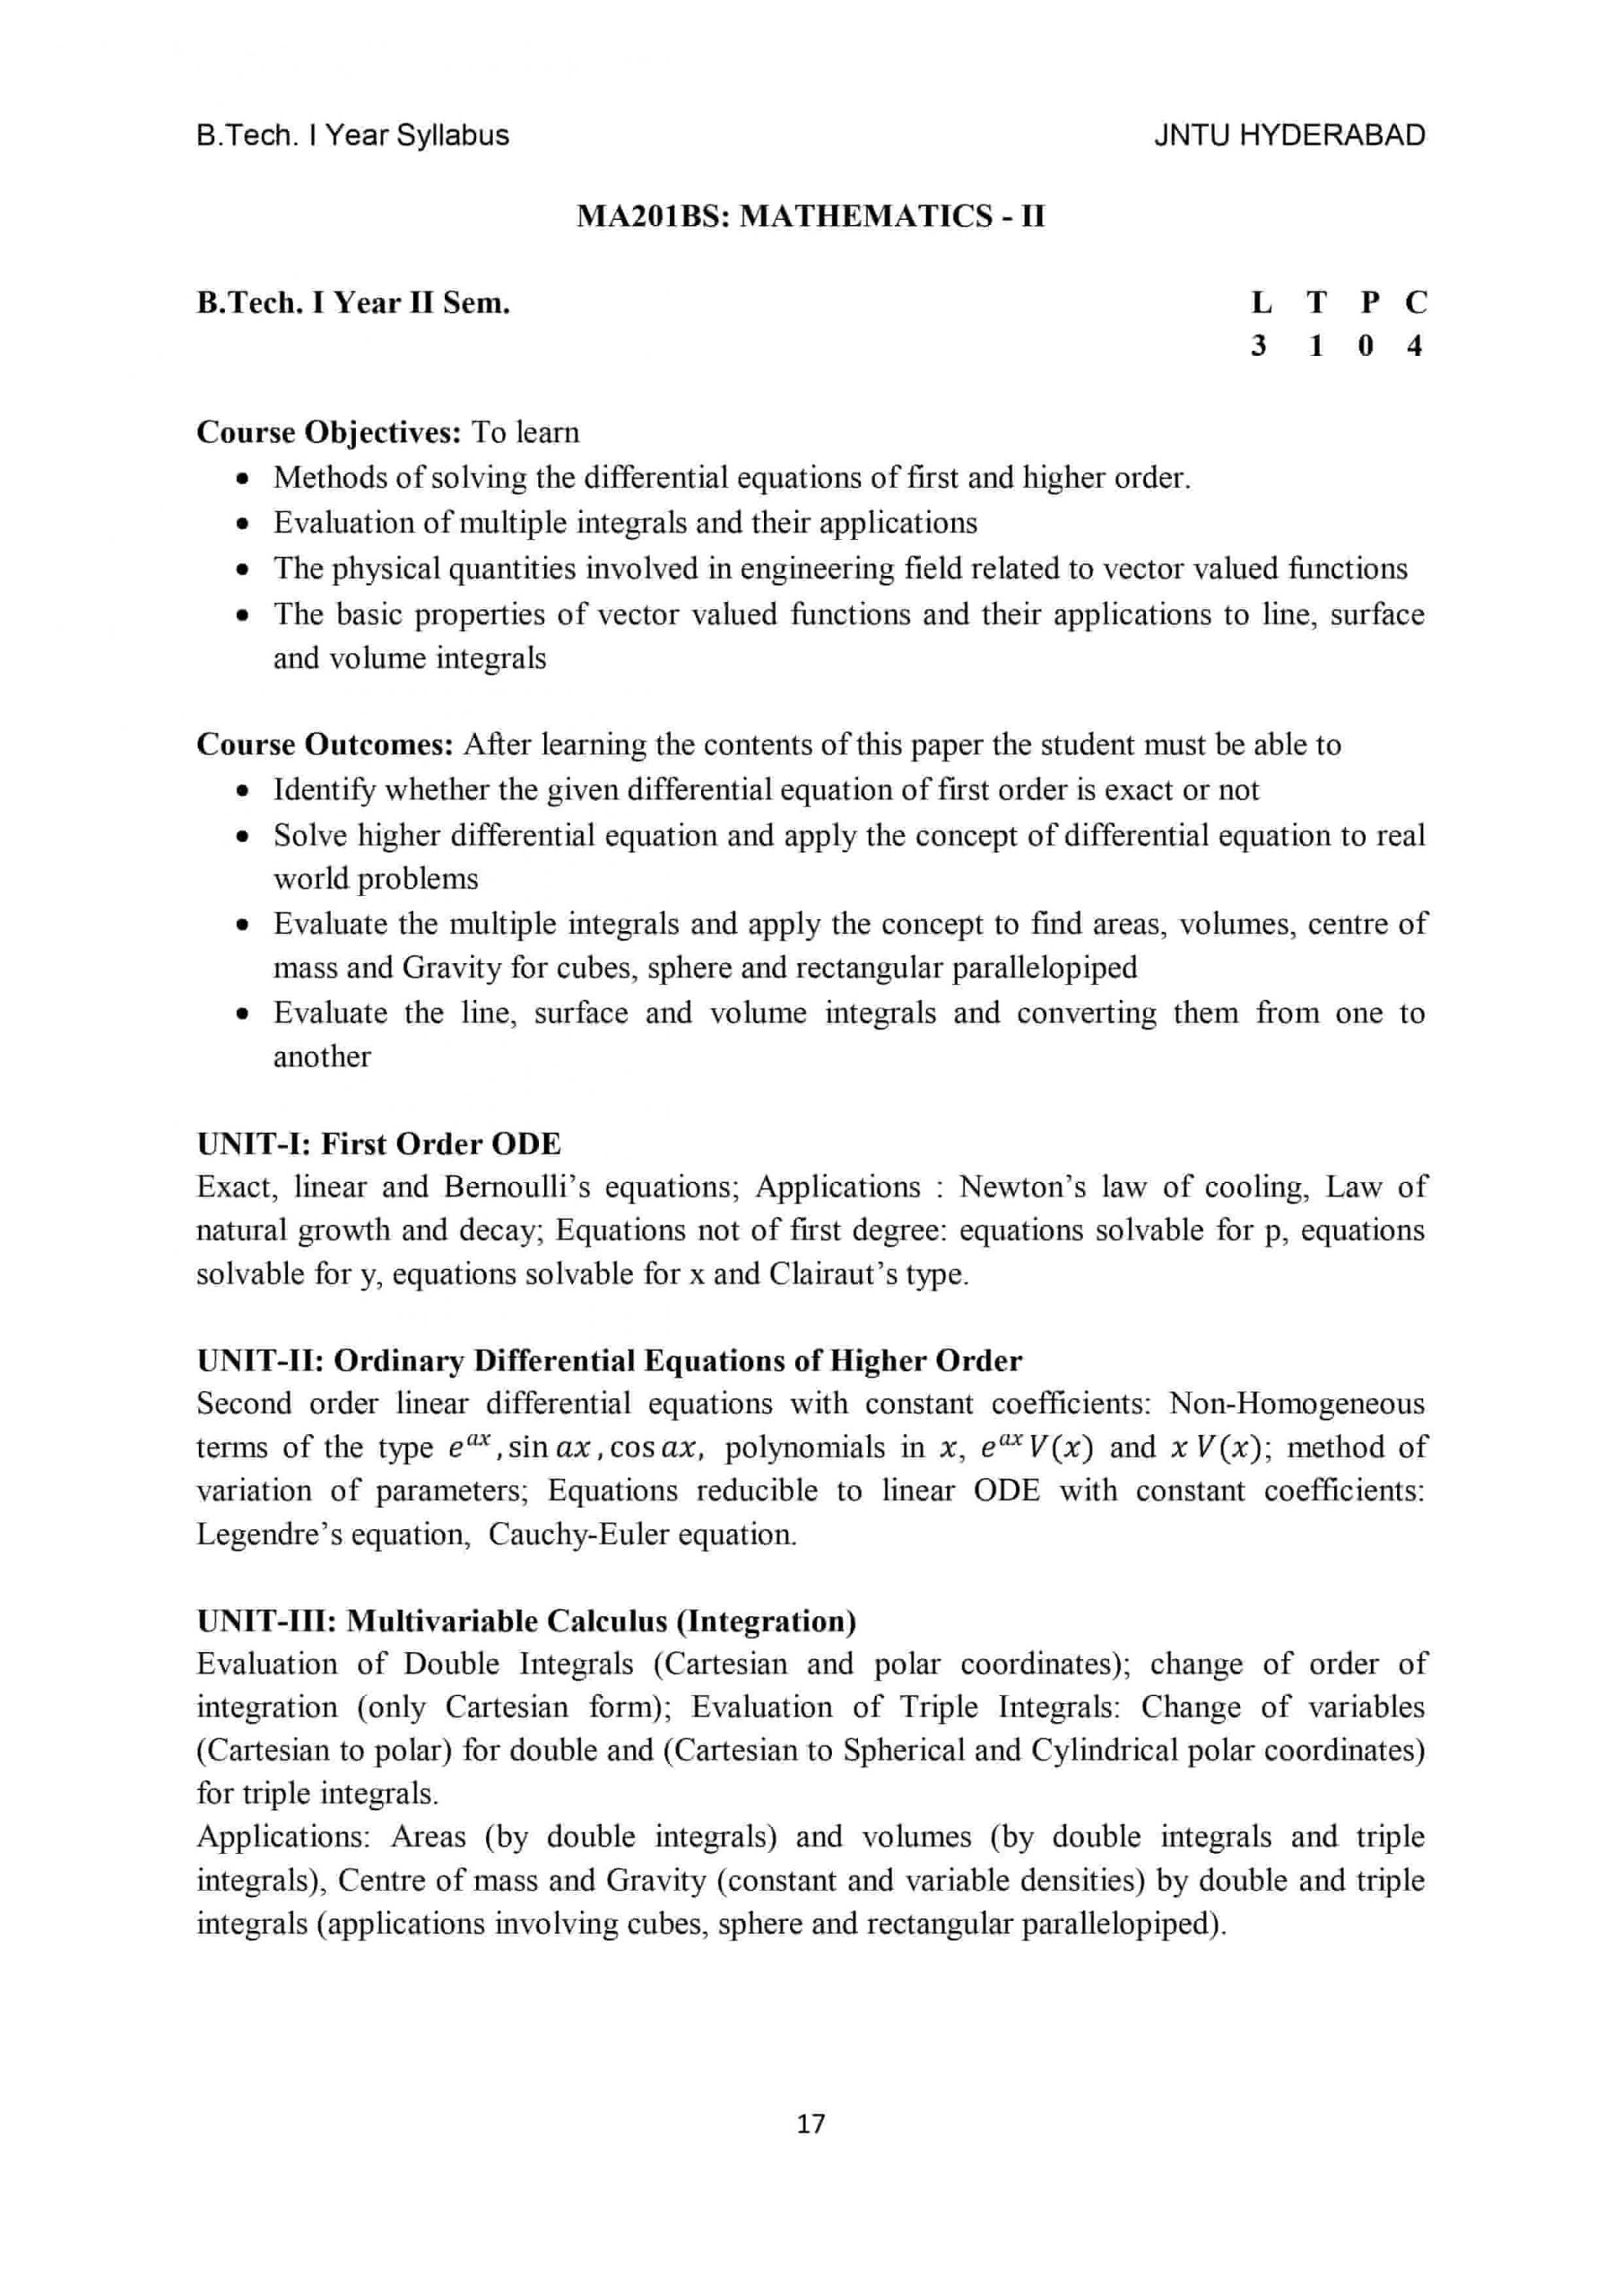 Mathematics 2 ( M2 ) btech r18 jntuh syllabus pdf download